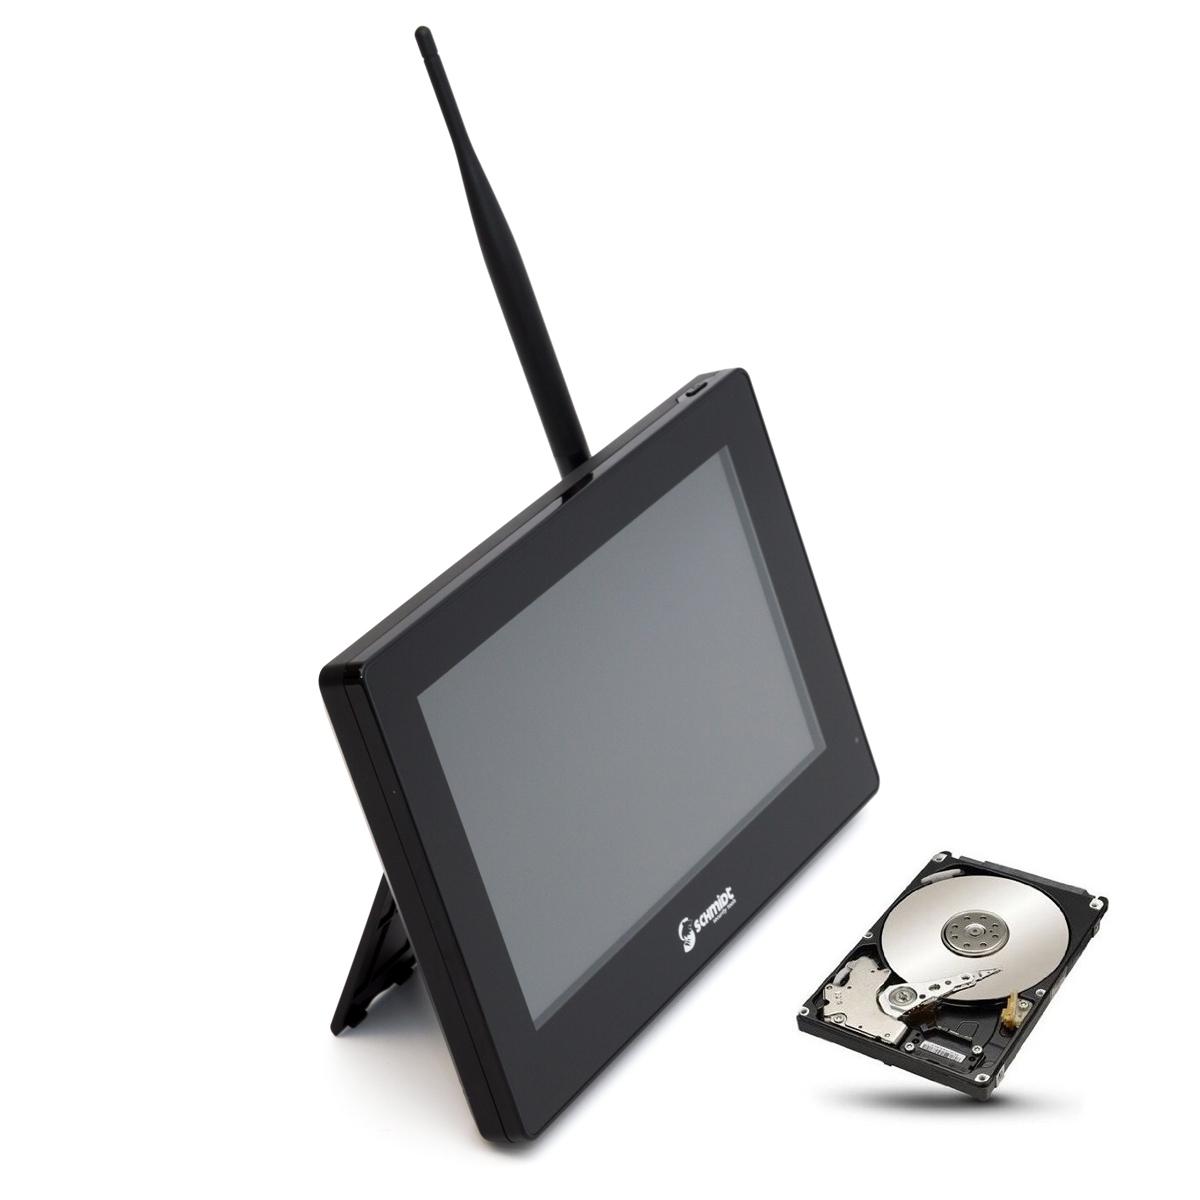 "SCHMIDT-Security-Tools Funk Überwachungssystem 3x Kamera 9"" Touch-Monitor mit Standfuß HD Videoüberwachungsanlage Drahtlos Überwachungsset Sicherheitssystem 2TB HDD Festplatte"